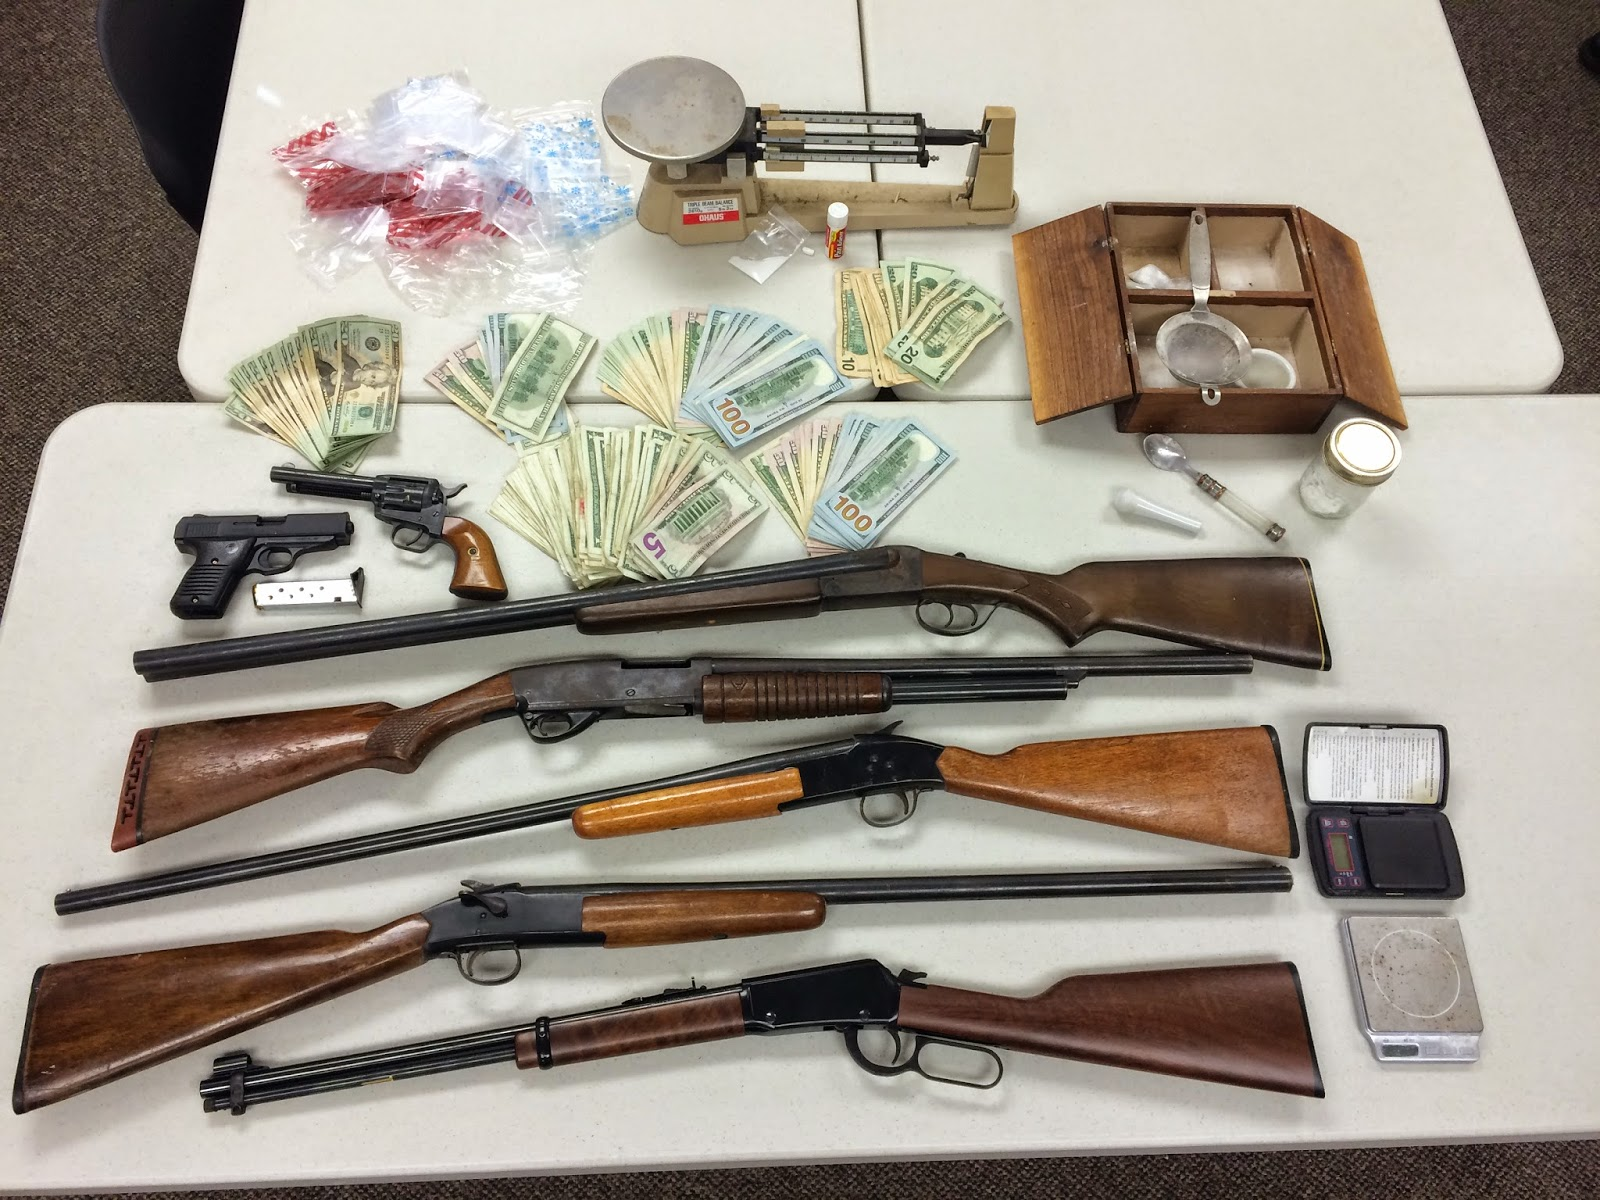 Darke County Cocaine Bust Yields Drugs Money Guns